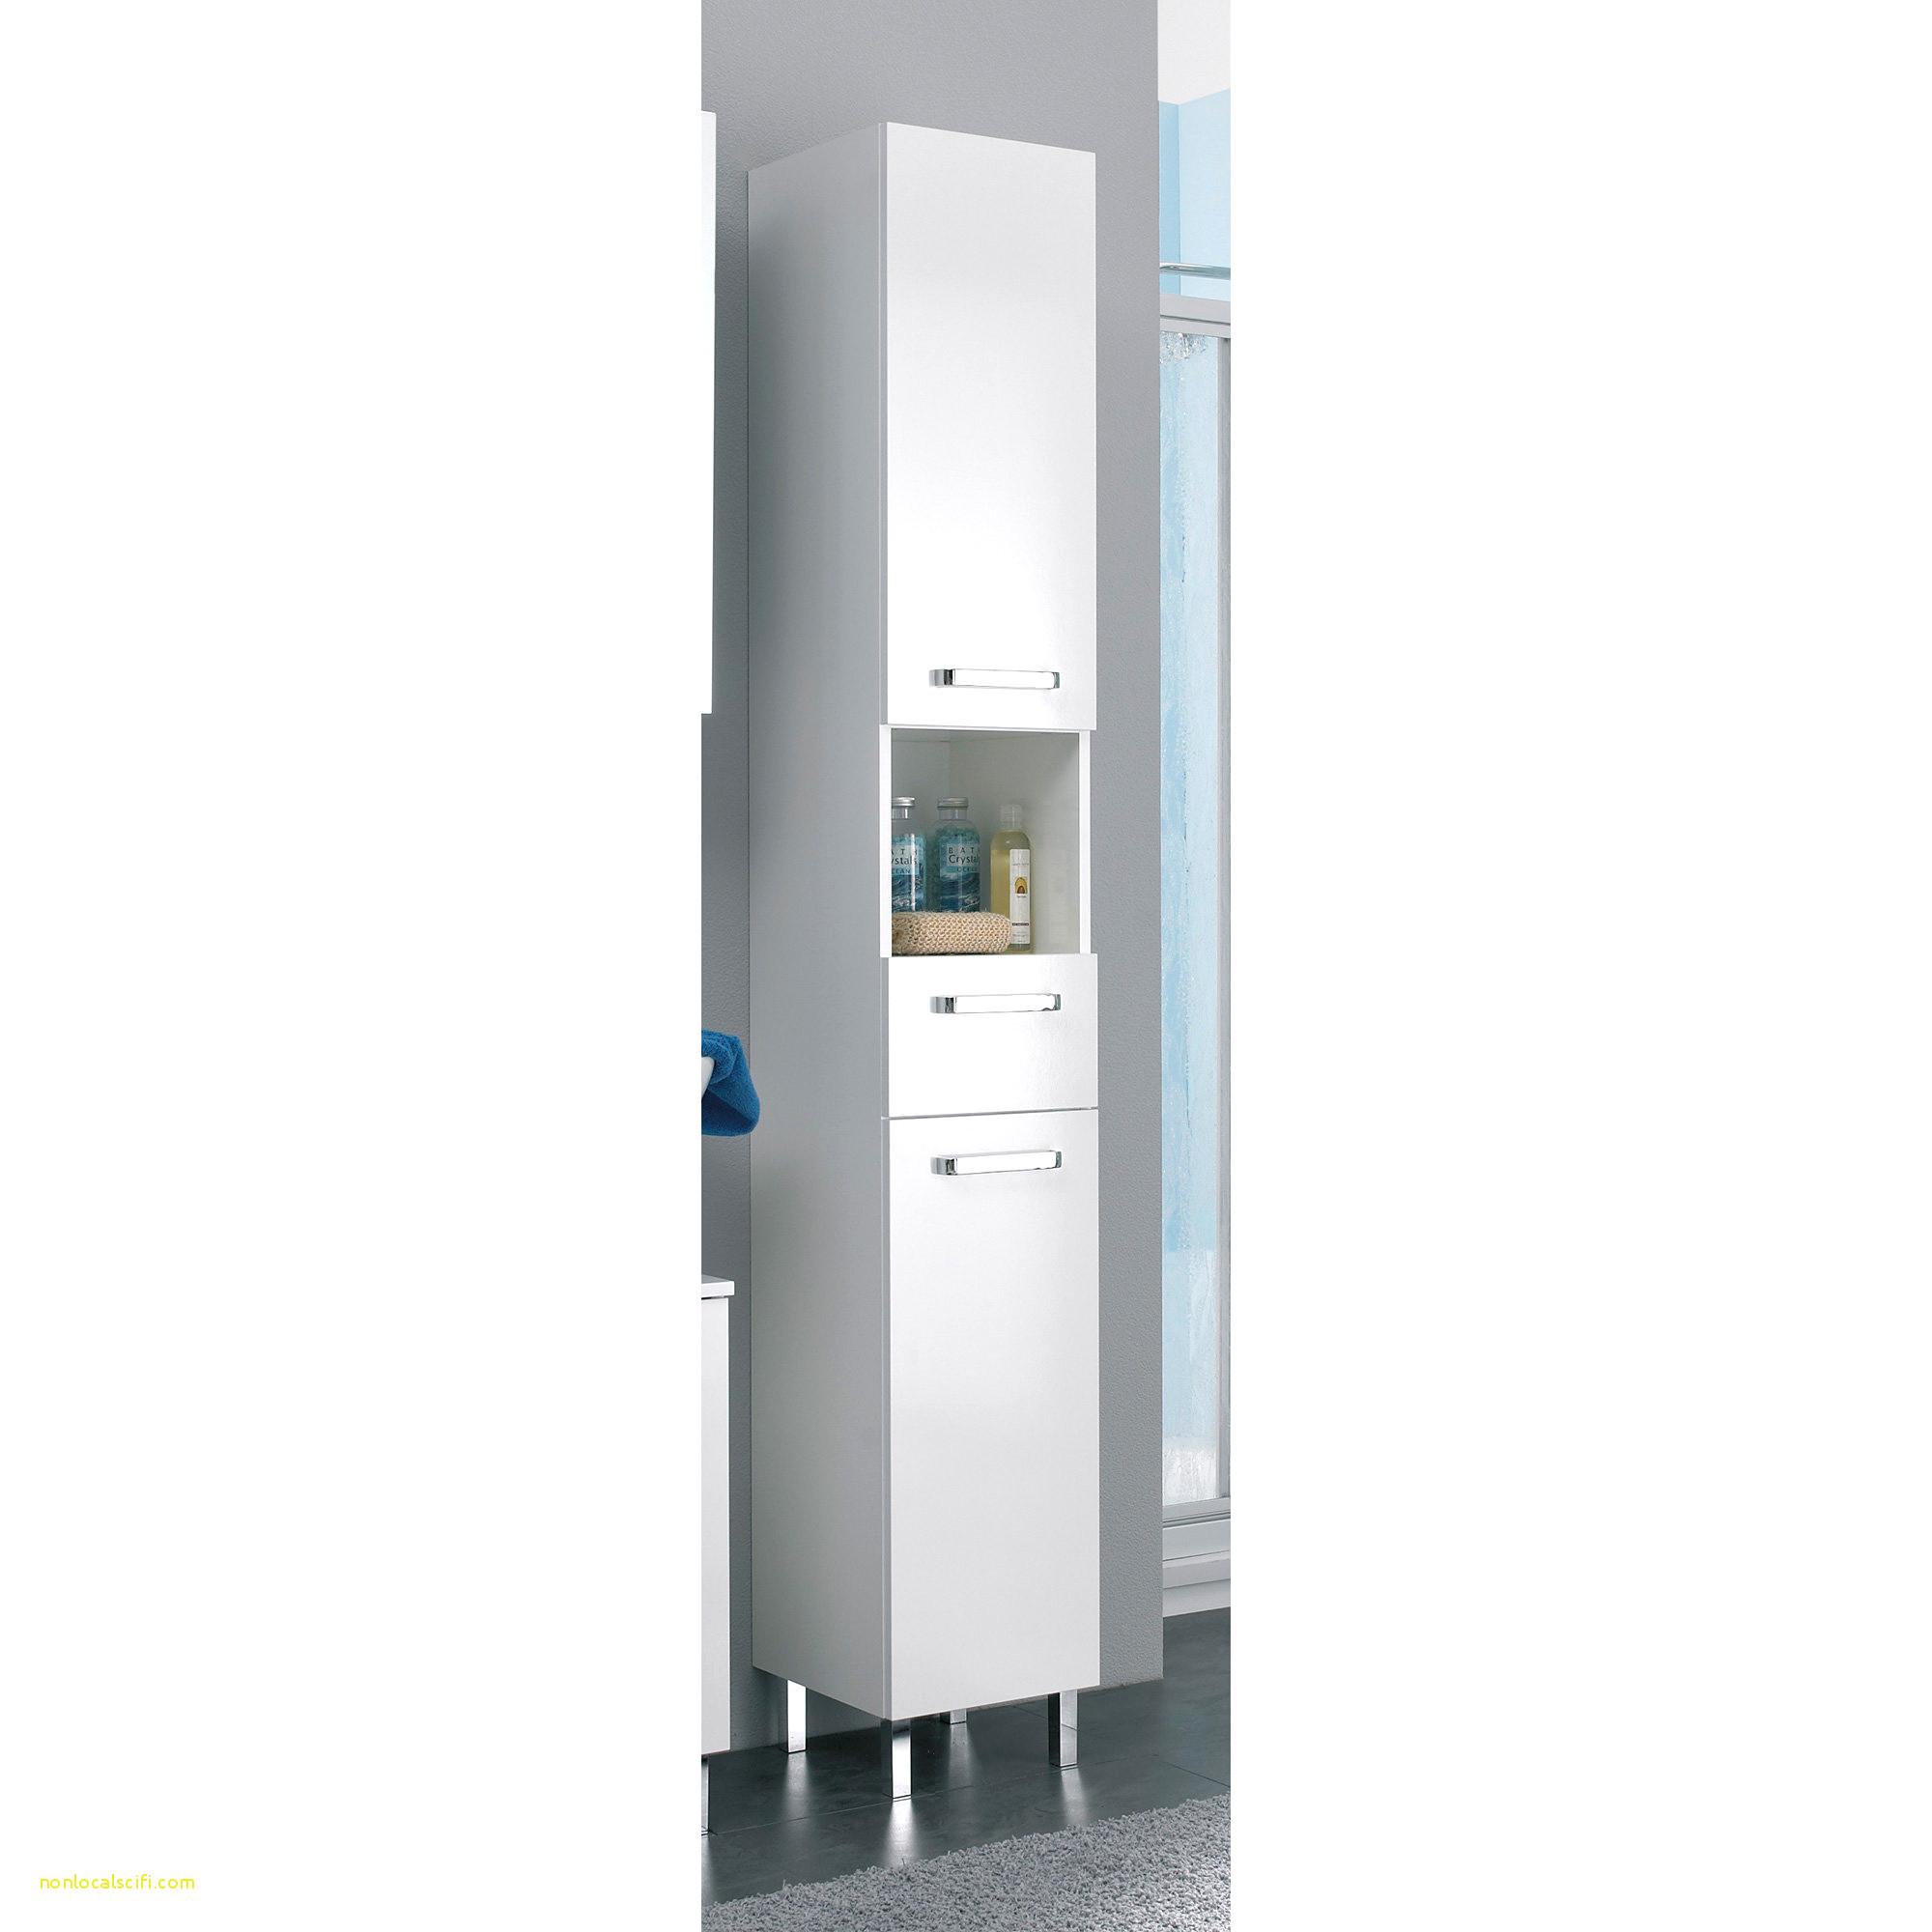 meuble colonne salle de bain brico depot colonne salle de bain pas cher brico depot of meuble colonne salle de bain brico depot